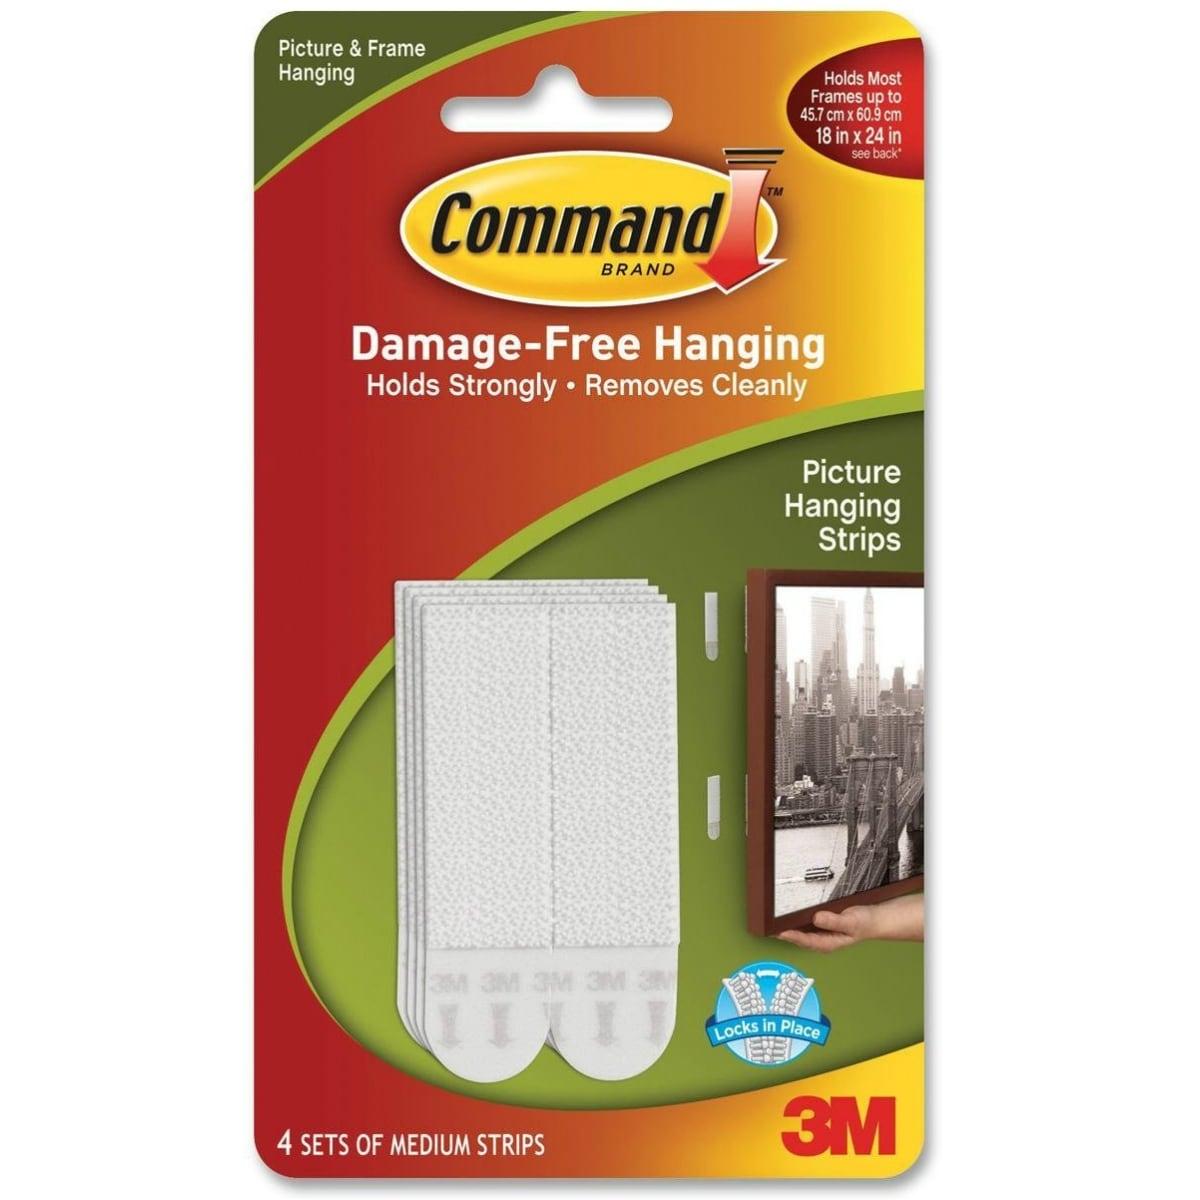 Command 17201-4PK Damage-Free Picture Hanging Strips, Medium, White, 4-Set